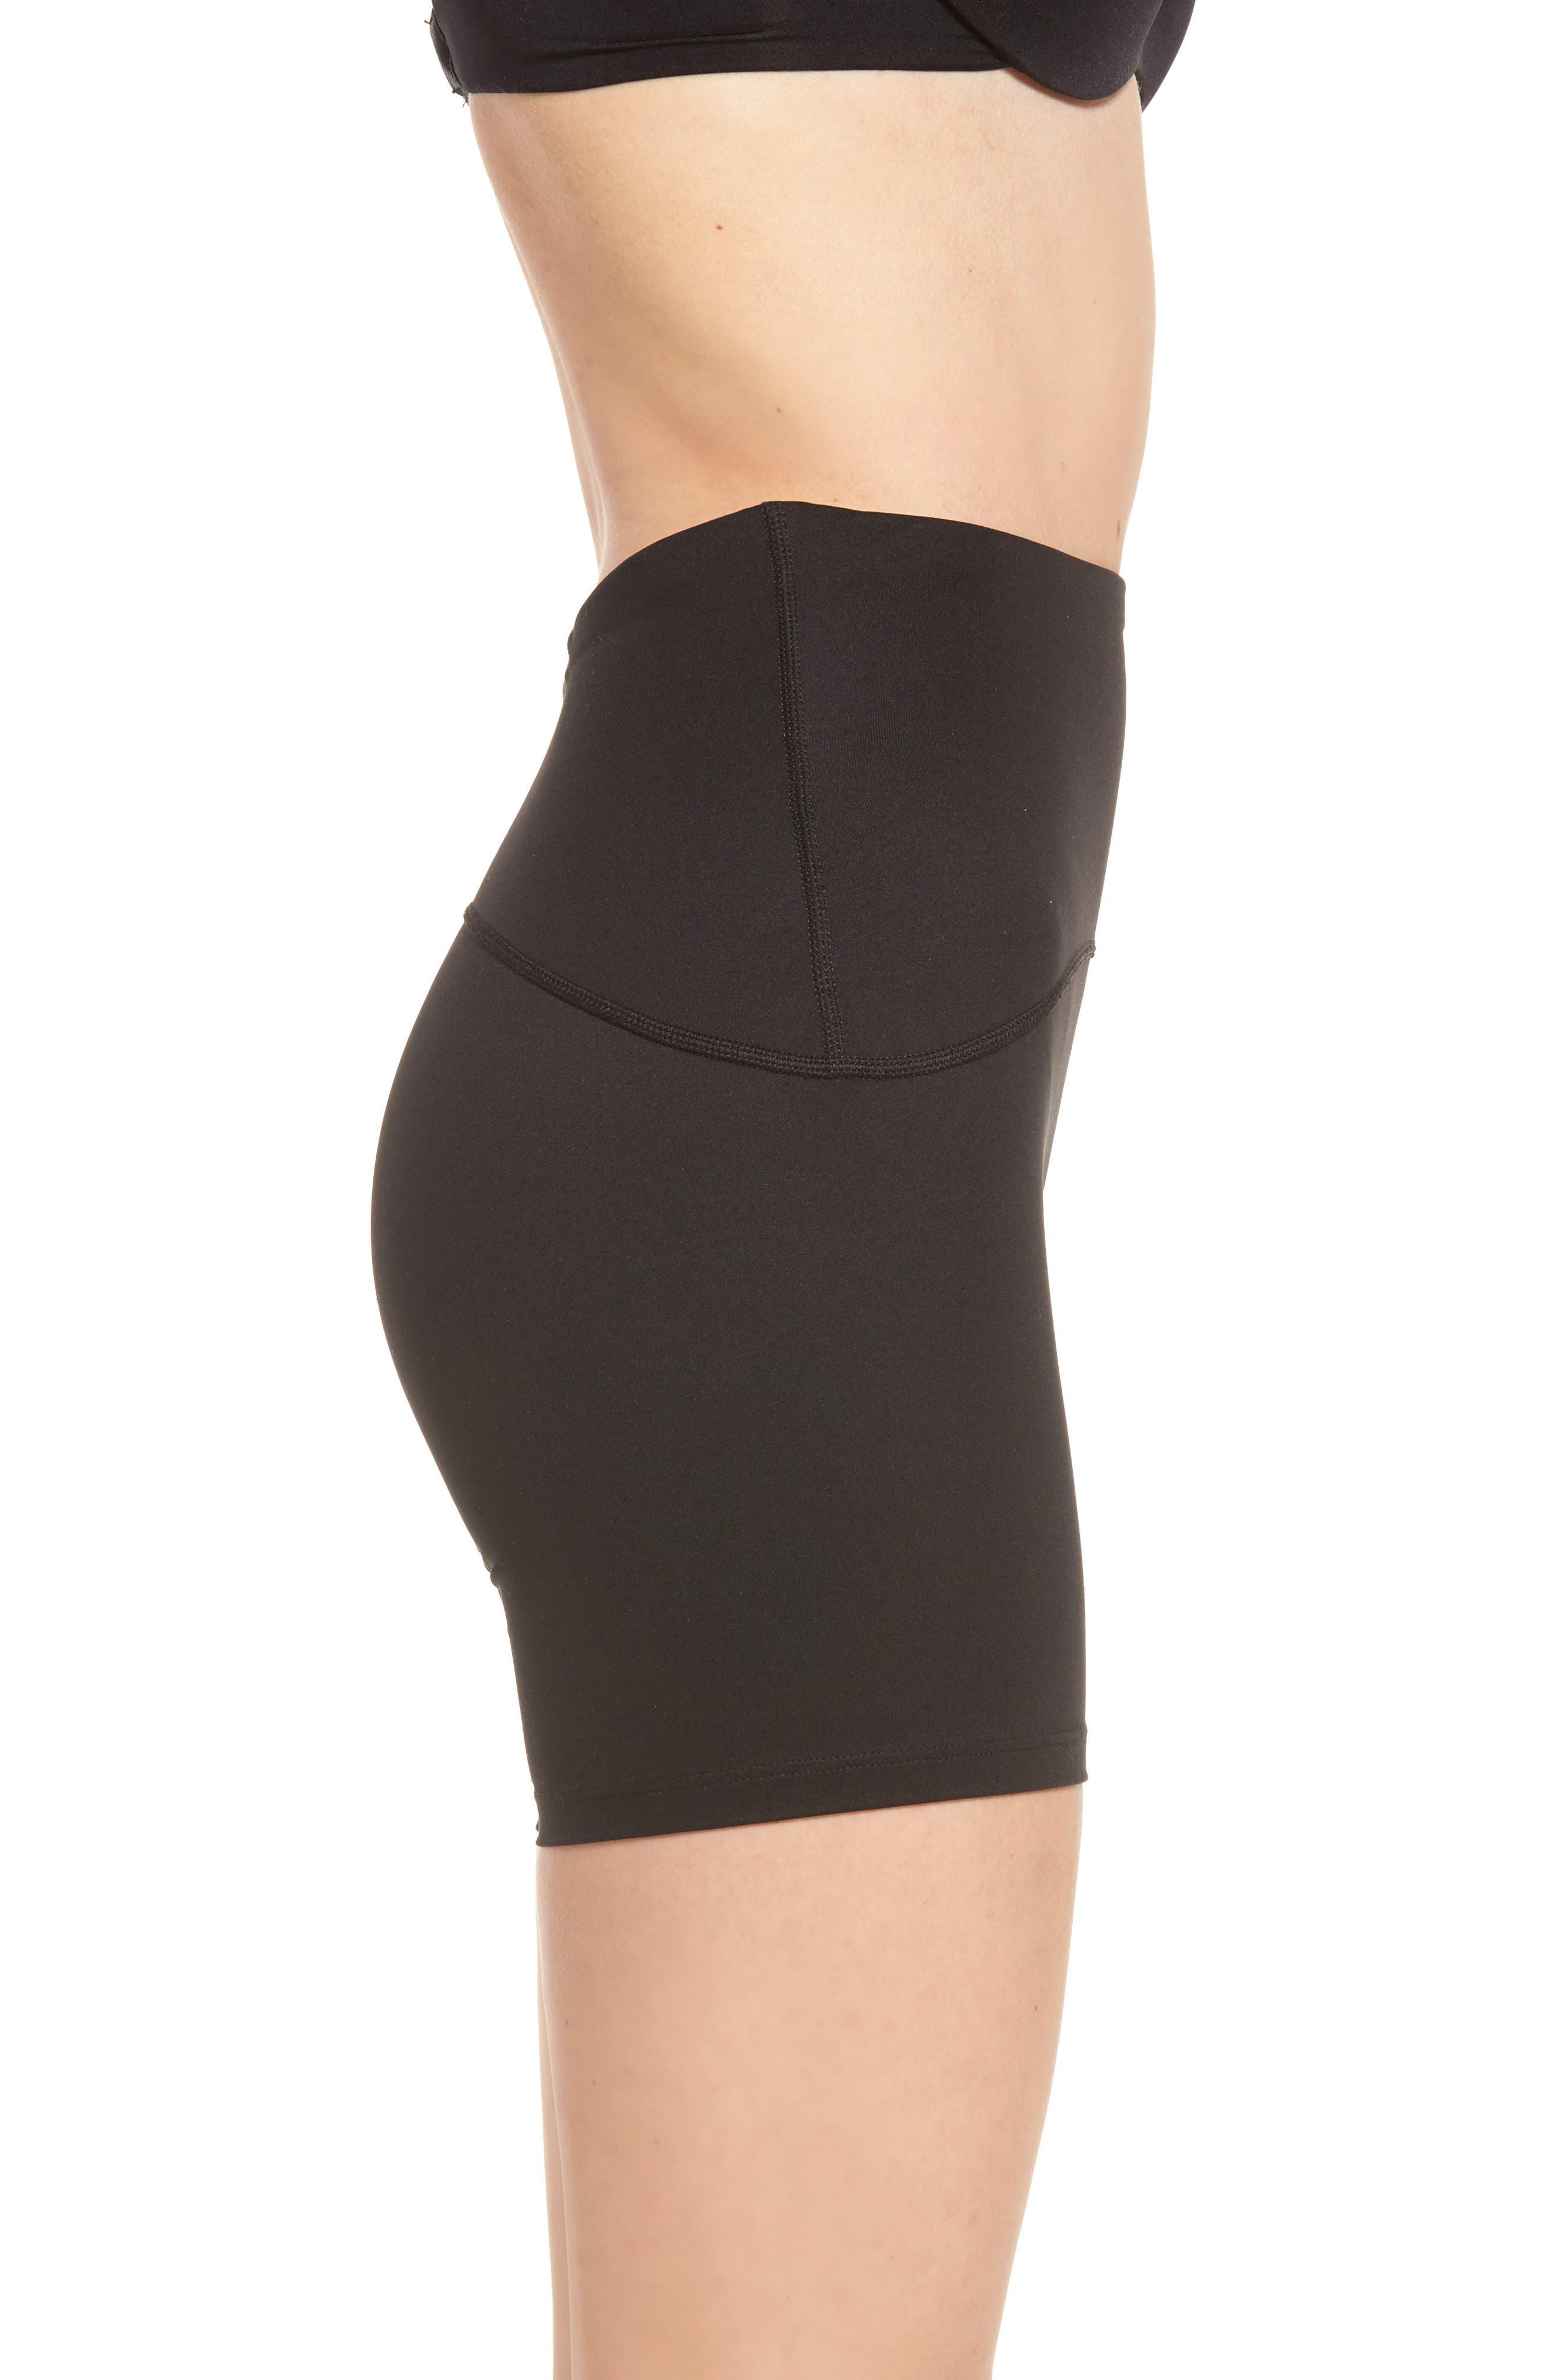 Sport Compression Shorts,                             Alternate thumbnail 3, color,                             BLACK